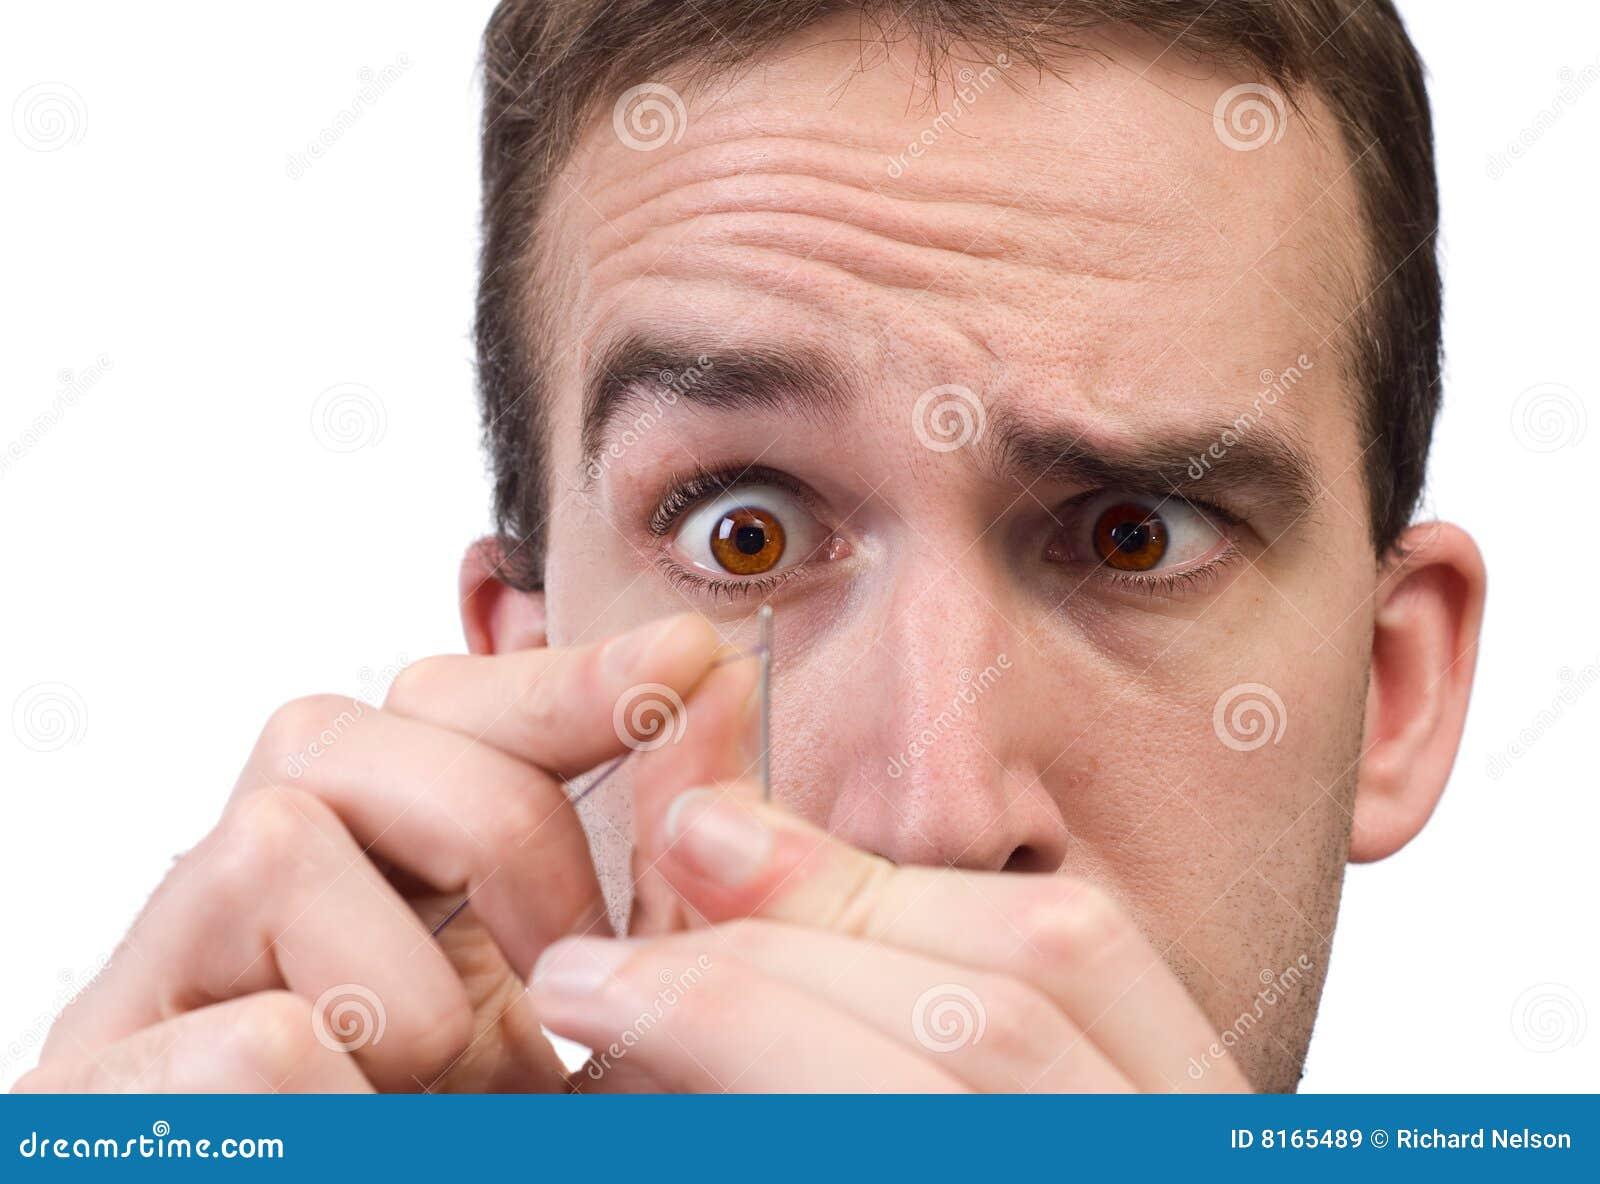 needles men Mix - he is scared of needles youtube  him scared of needles - duration: 1:18 brandy nikki mason 5,769 views 1:18 language: english.